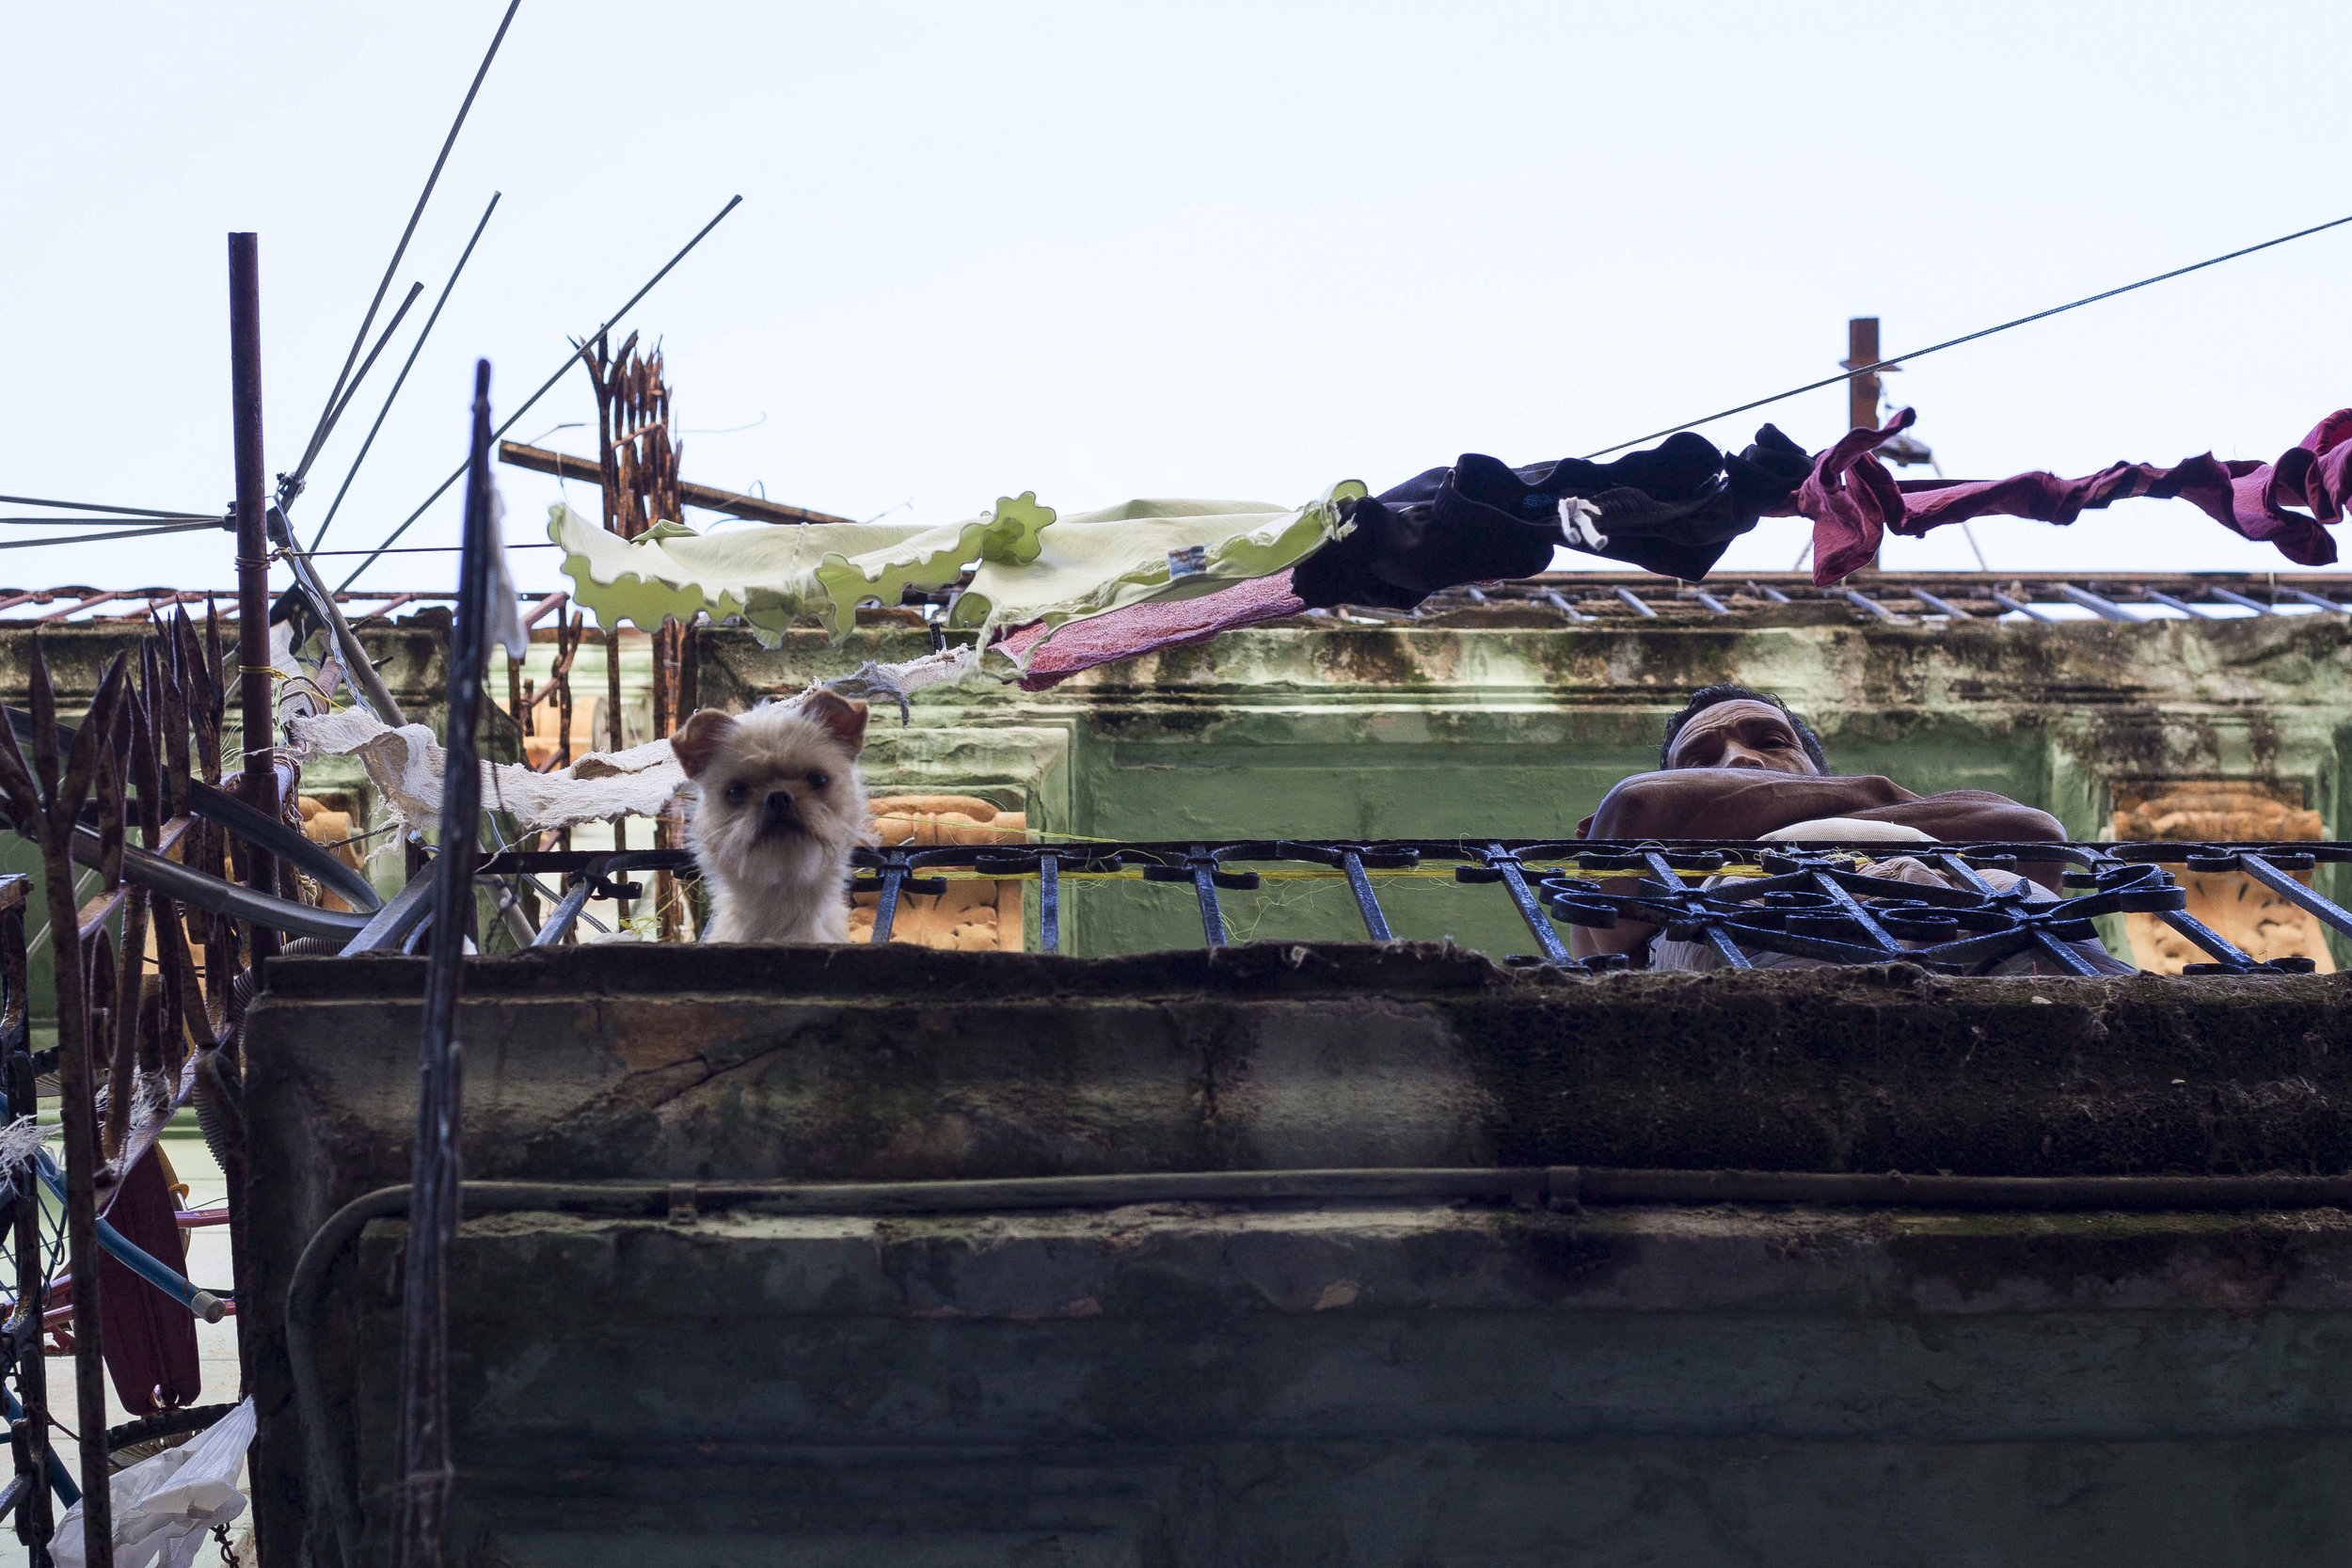 CS_20140105_CanonEOS450D_Habana (2)-2RRR.jpg